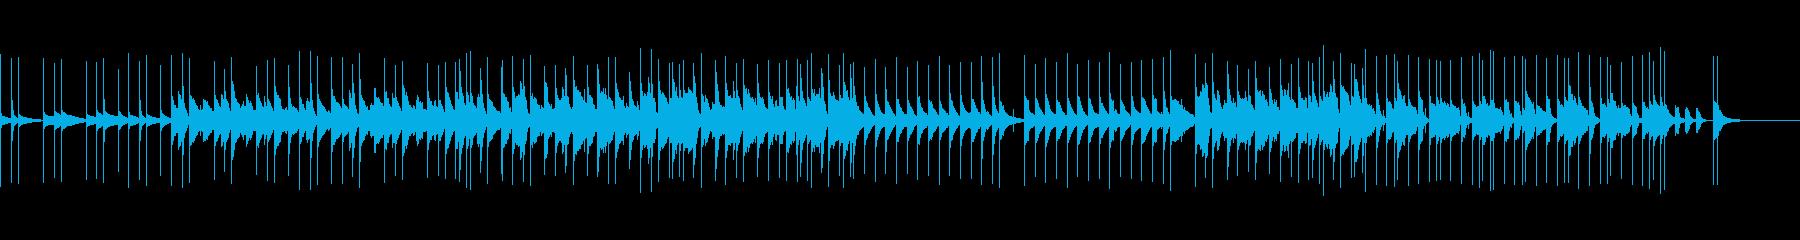 KANTほのぼのワクワクBGMの再生済みの波形